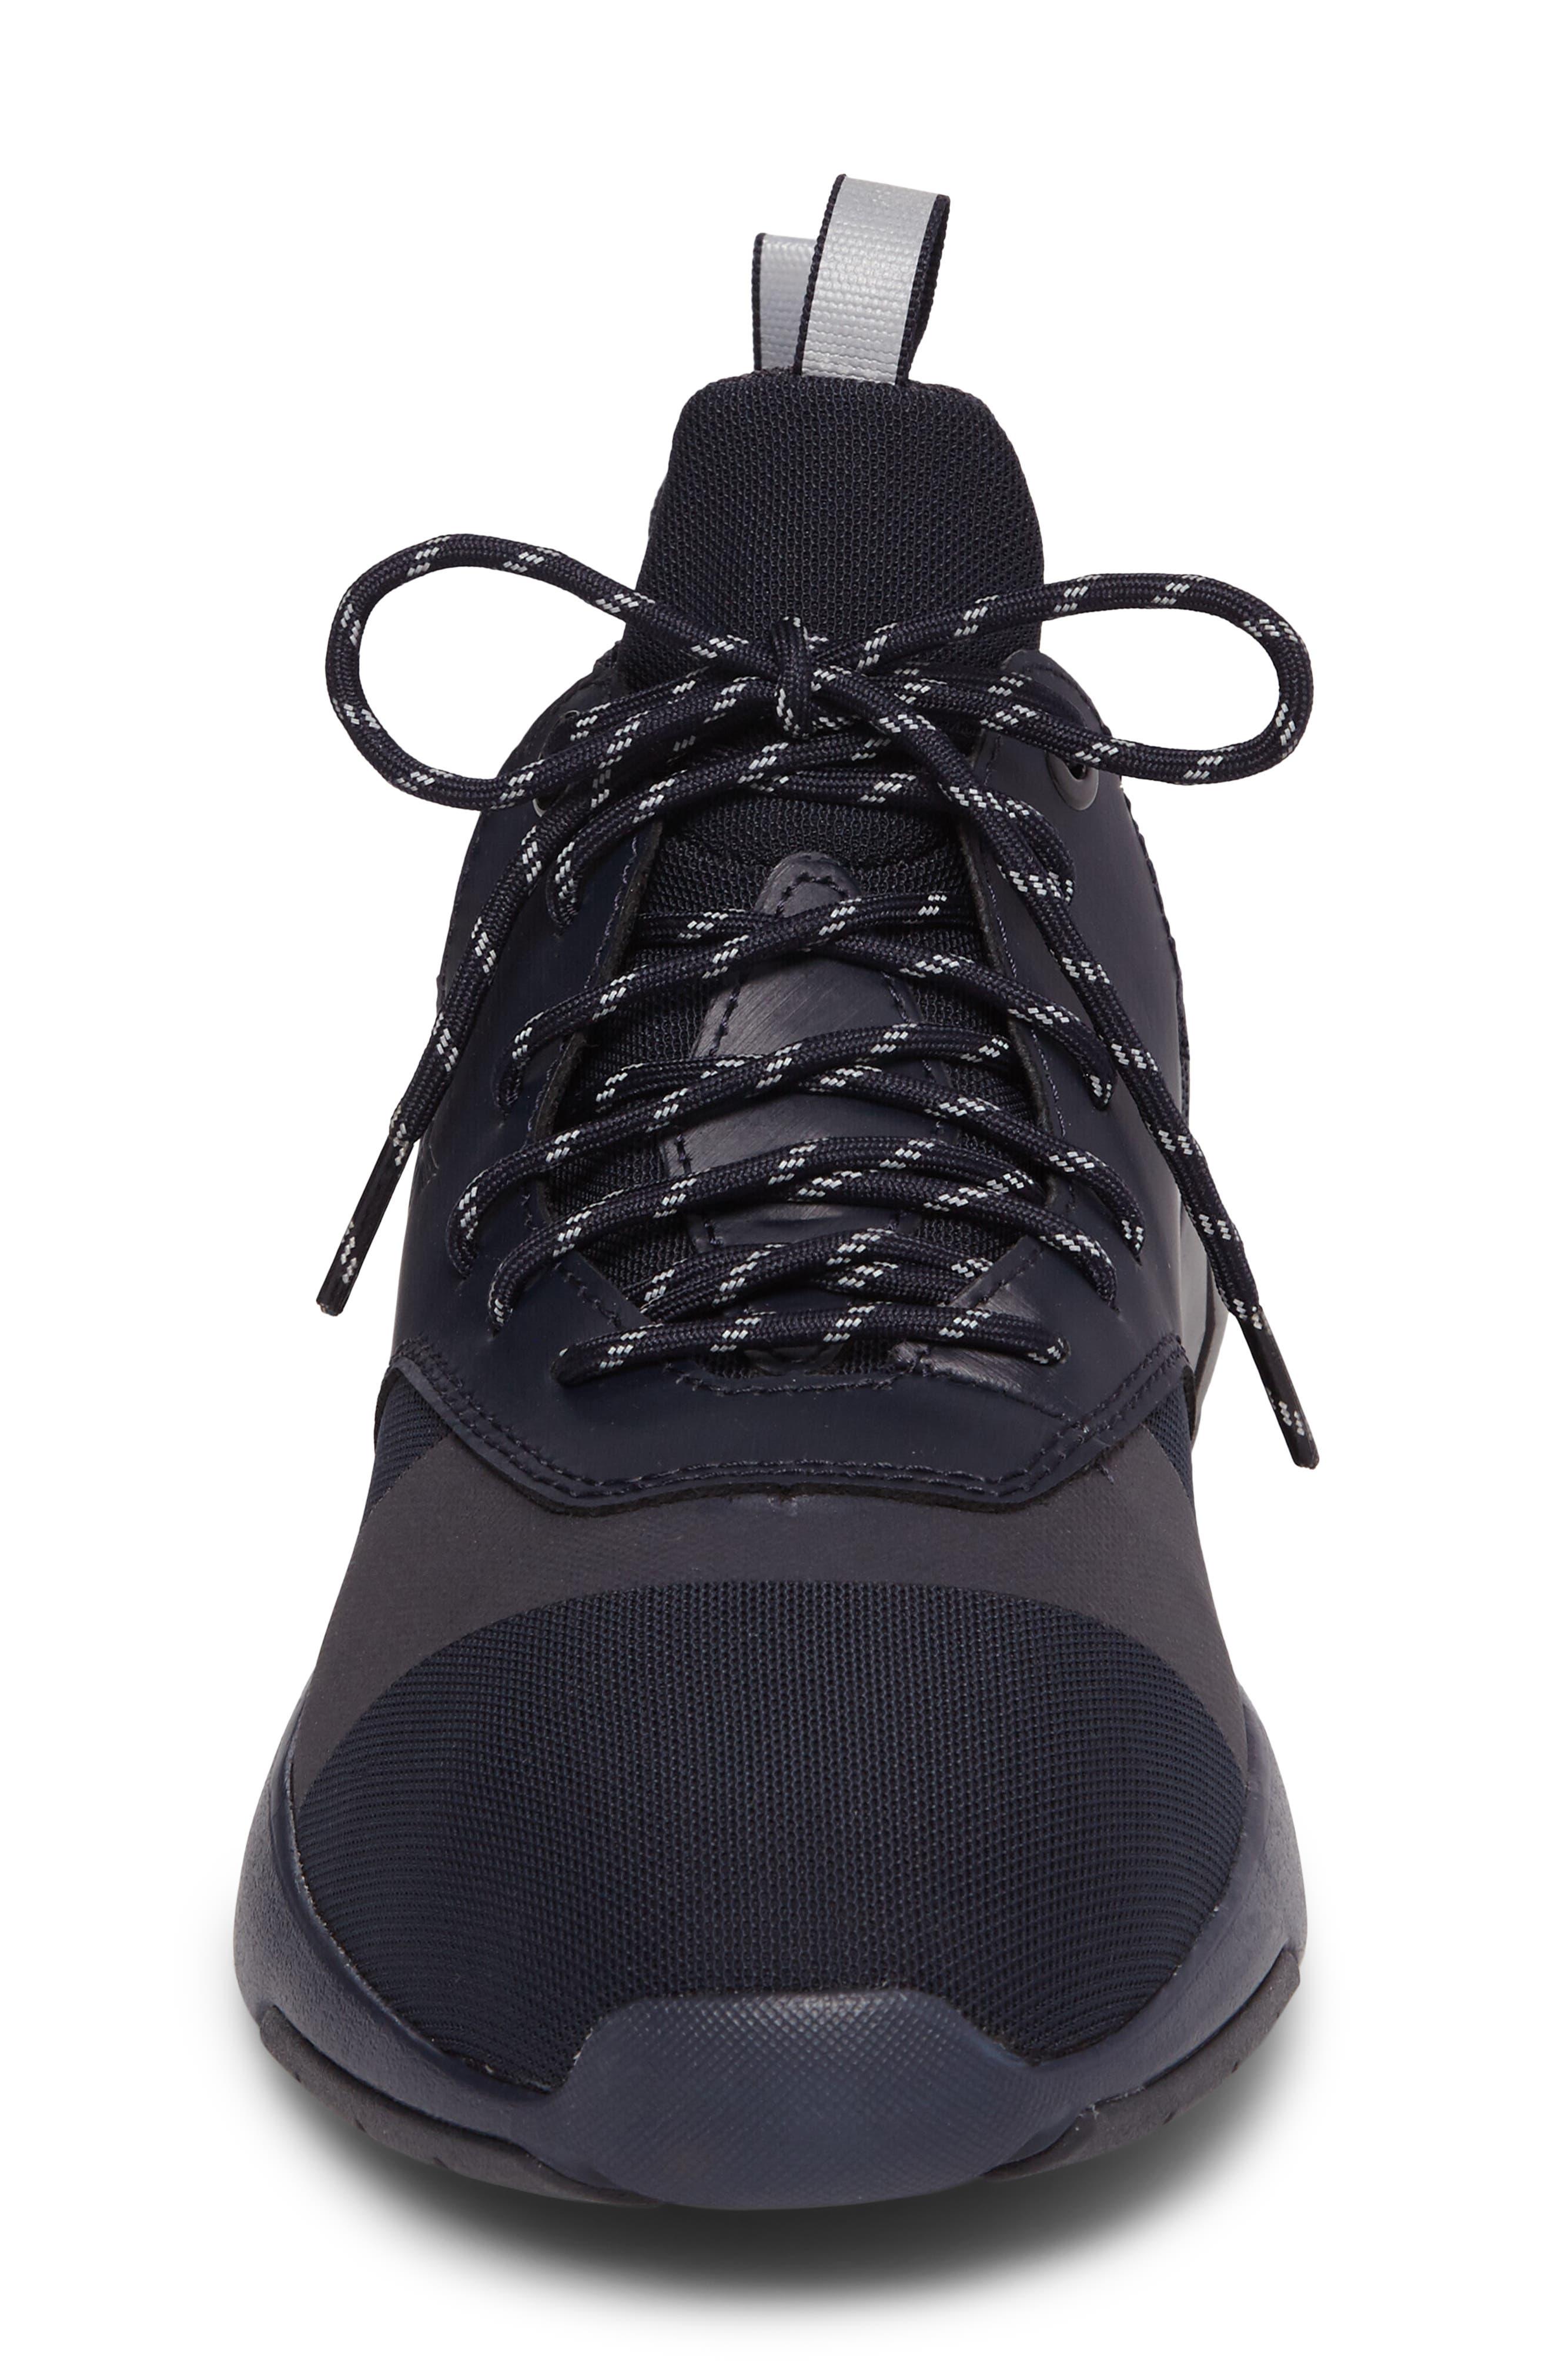 Motus Sneaker,                             Alternate thumbnail 4, color,                             Navy Reflective Leather